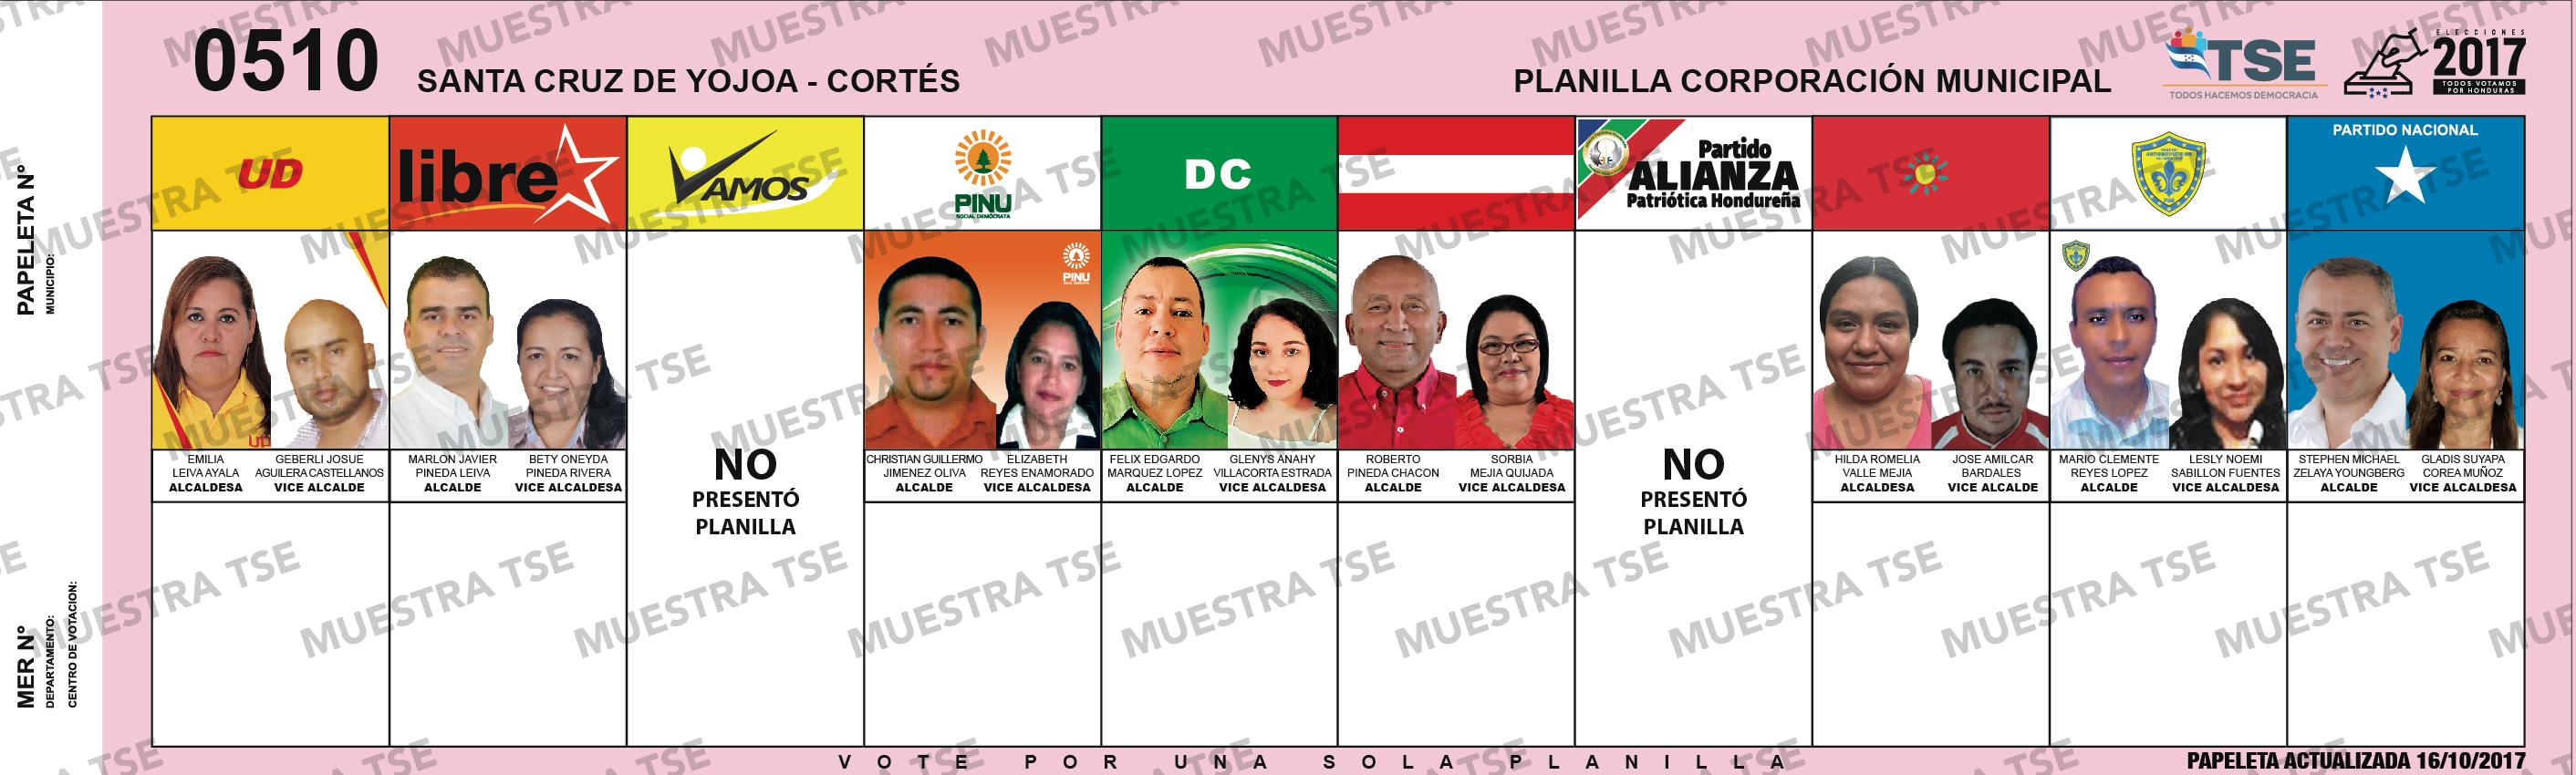 PAPELETA ELECTORAL - SANTA CRUZ DE YOJOA